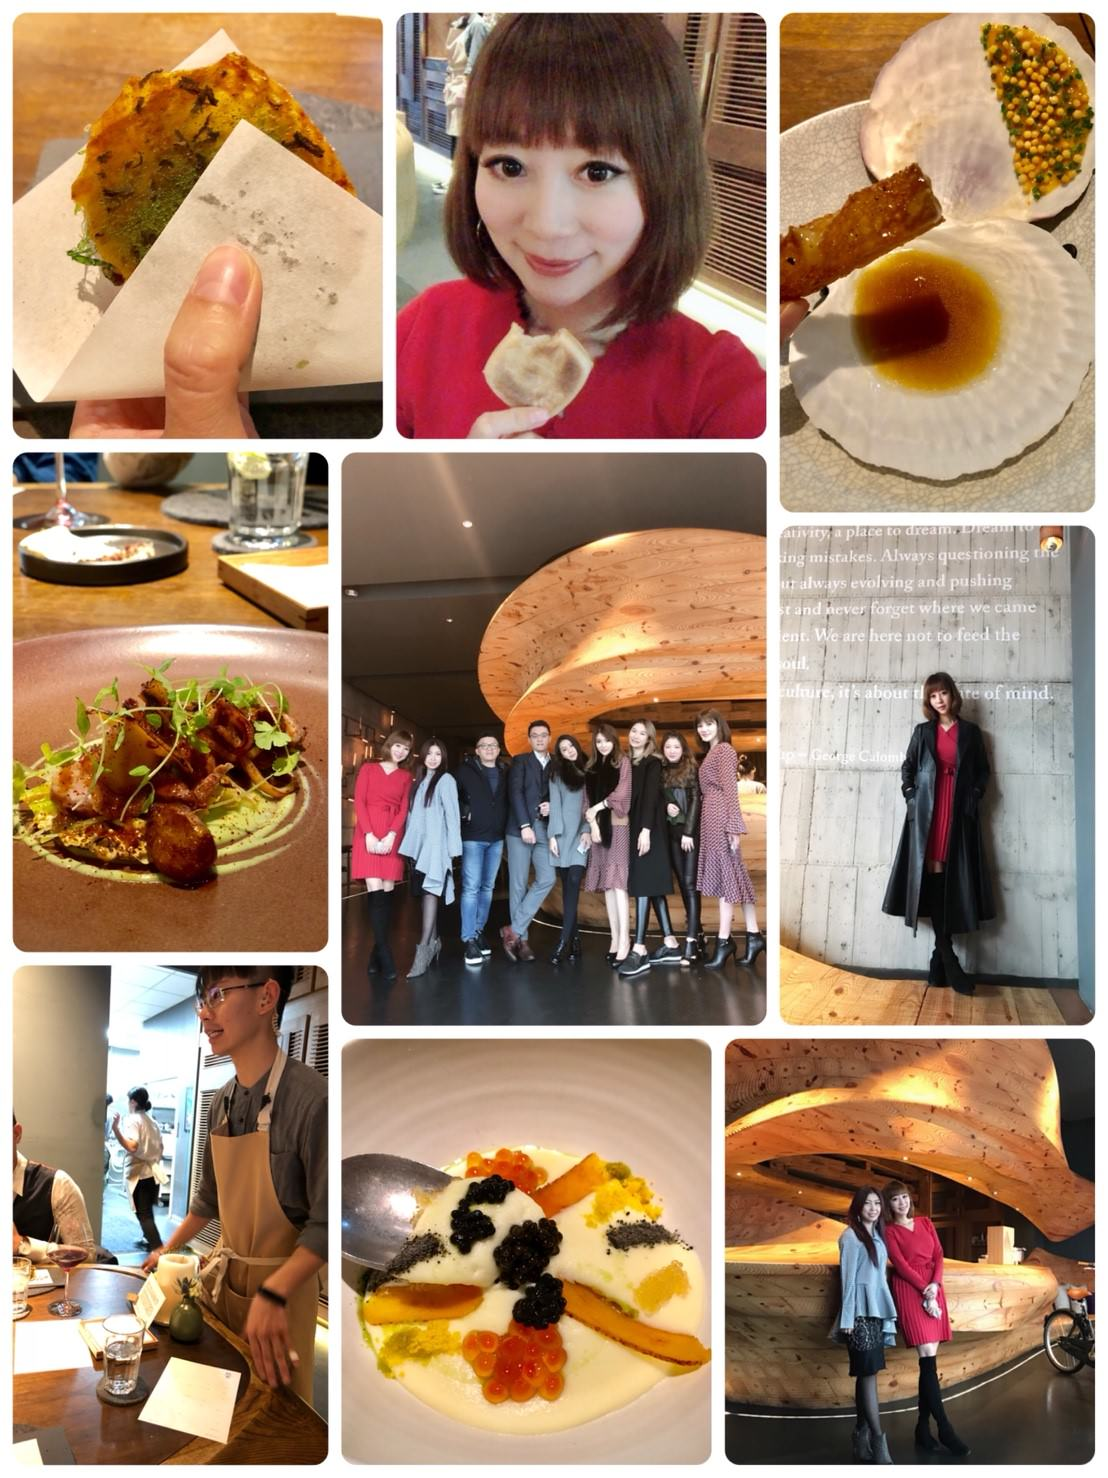 RAW 全台最難訂的餐廳 ❤️2018年度精選菜單❤️ 江振誠主廚讓人讚嘆的創意台灣好味道(≧∇≦)/